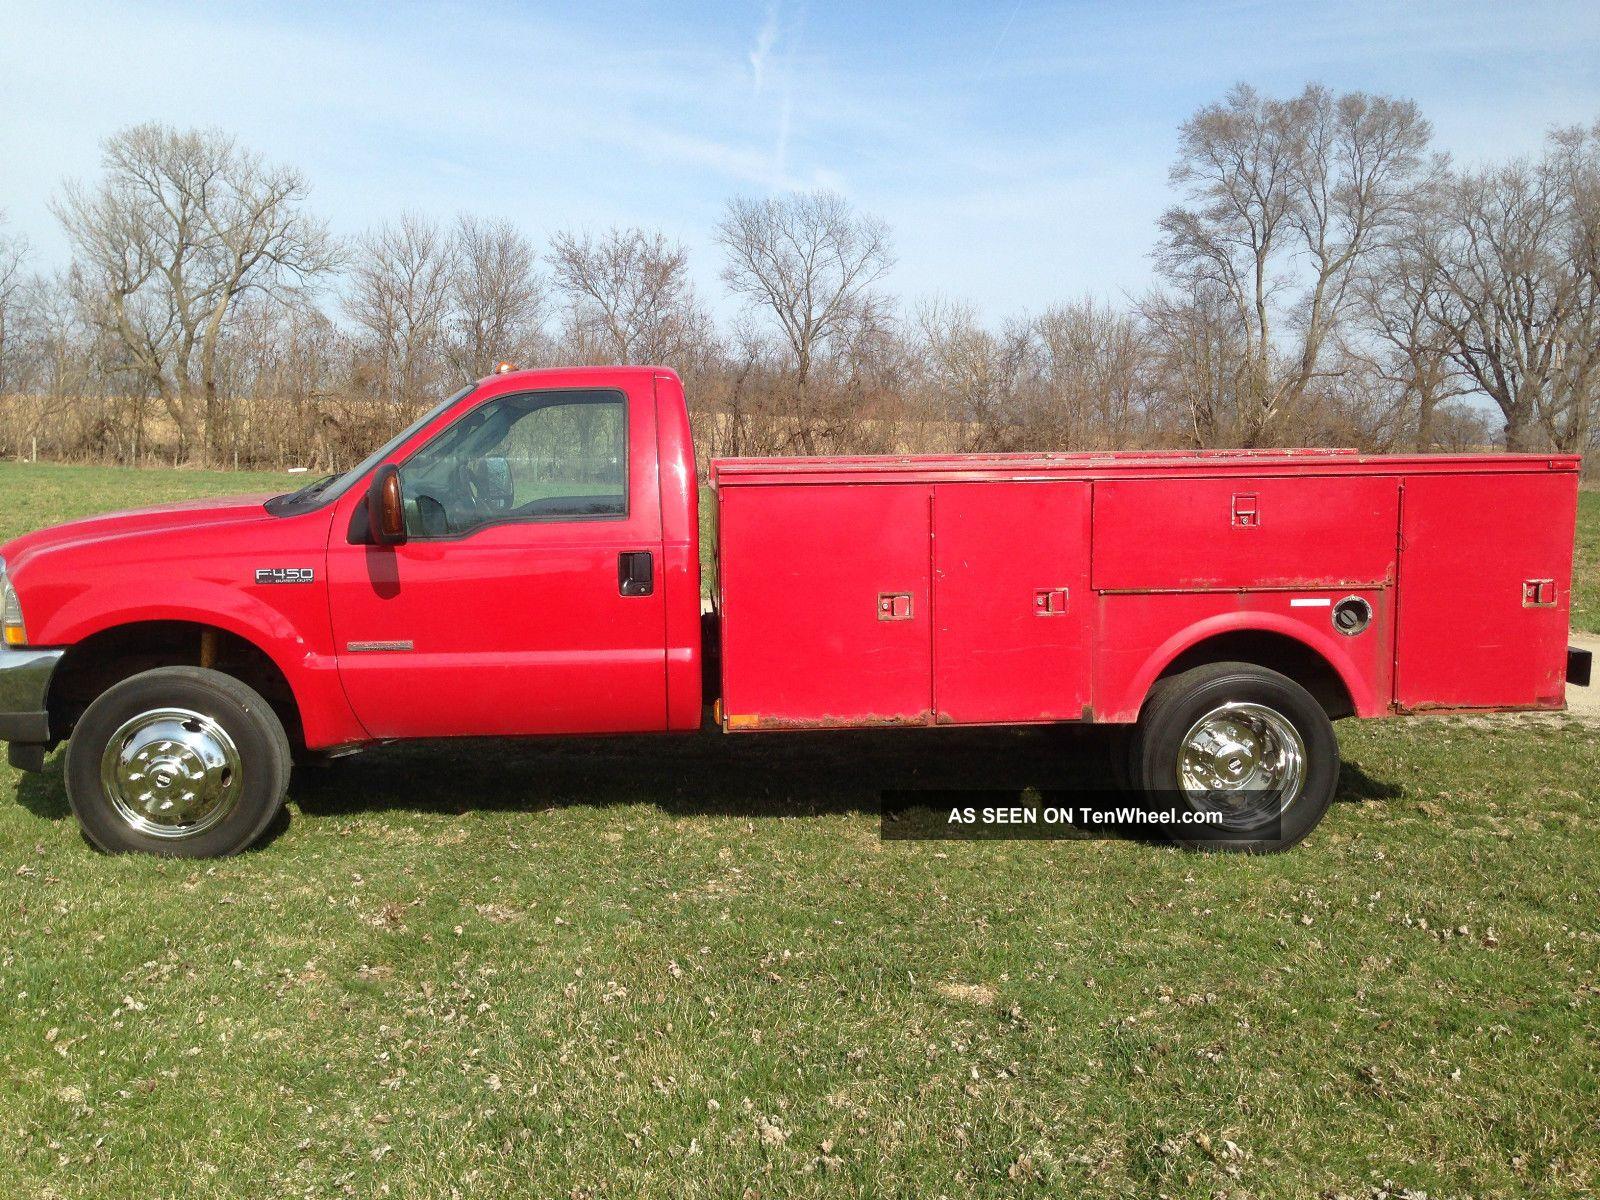 2004 ford f 450 superduty 4x4 turbo diesel service truck. Black Bedroom Furniture Sets. Home Design Ideas